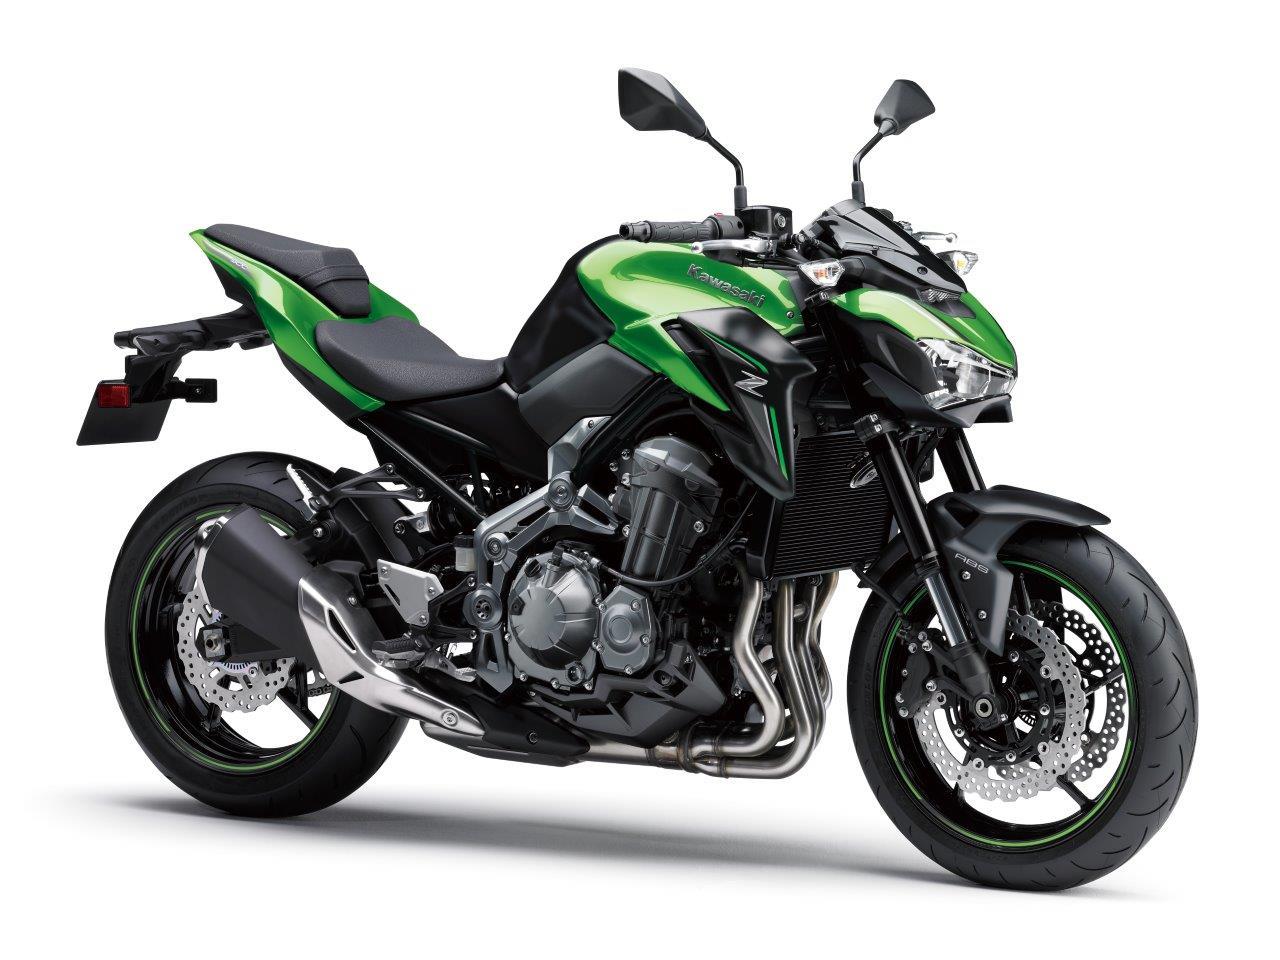 A2 geschikte Kawasaki Z900 70kW nu in de showroom!